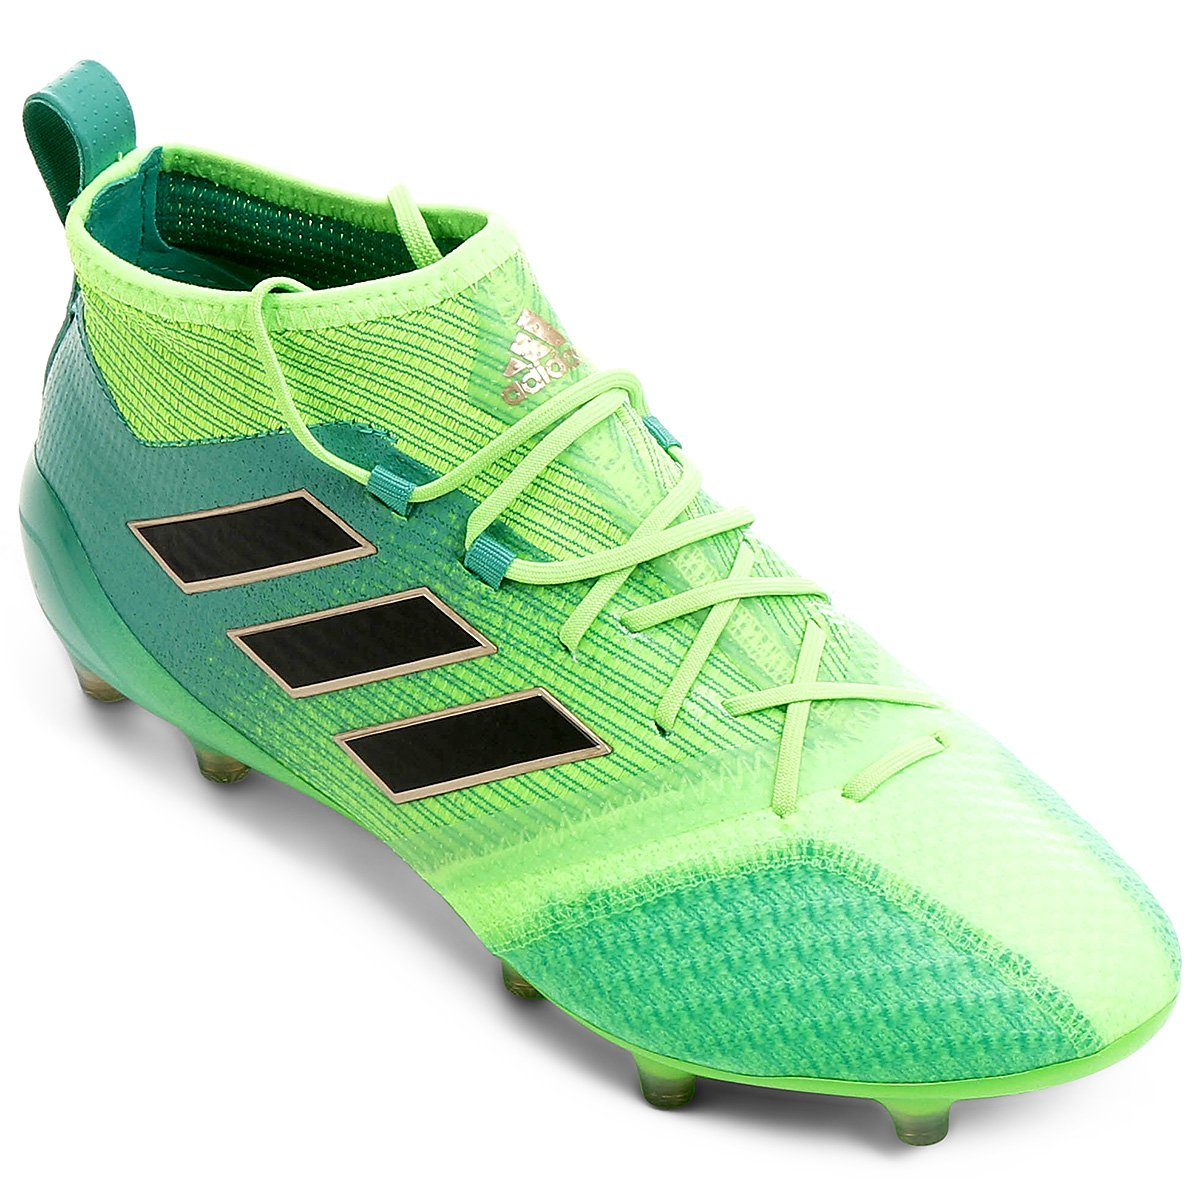 4468b9eeac7 Chuteira Campo Adidas Ace 17.1 FG